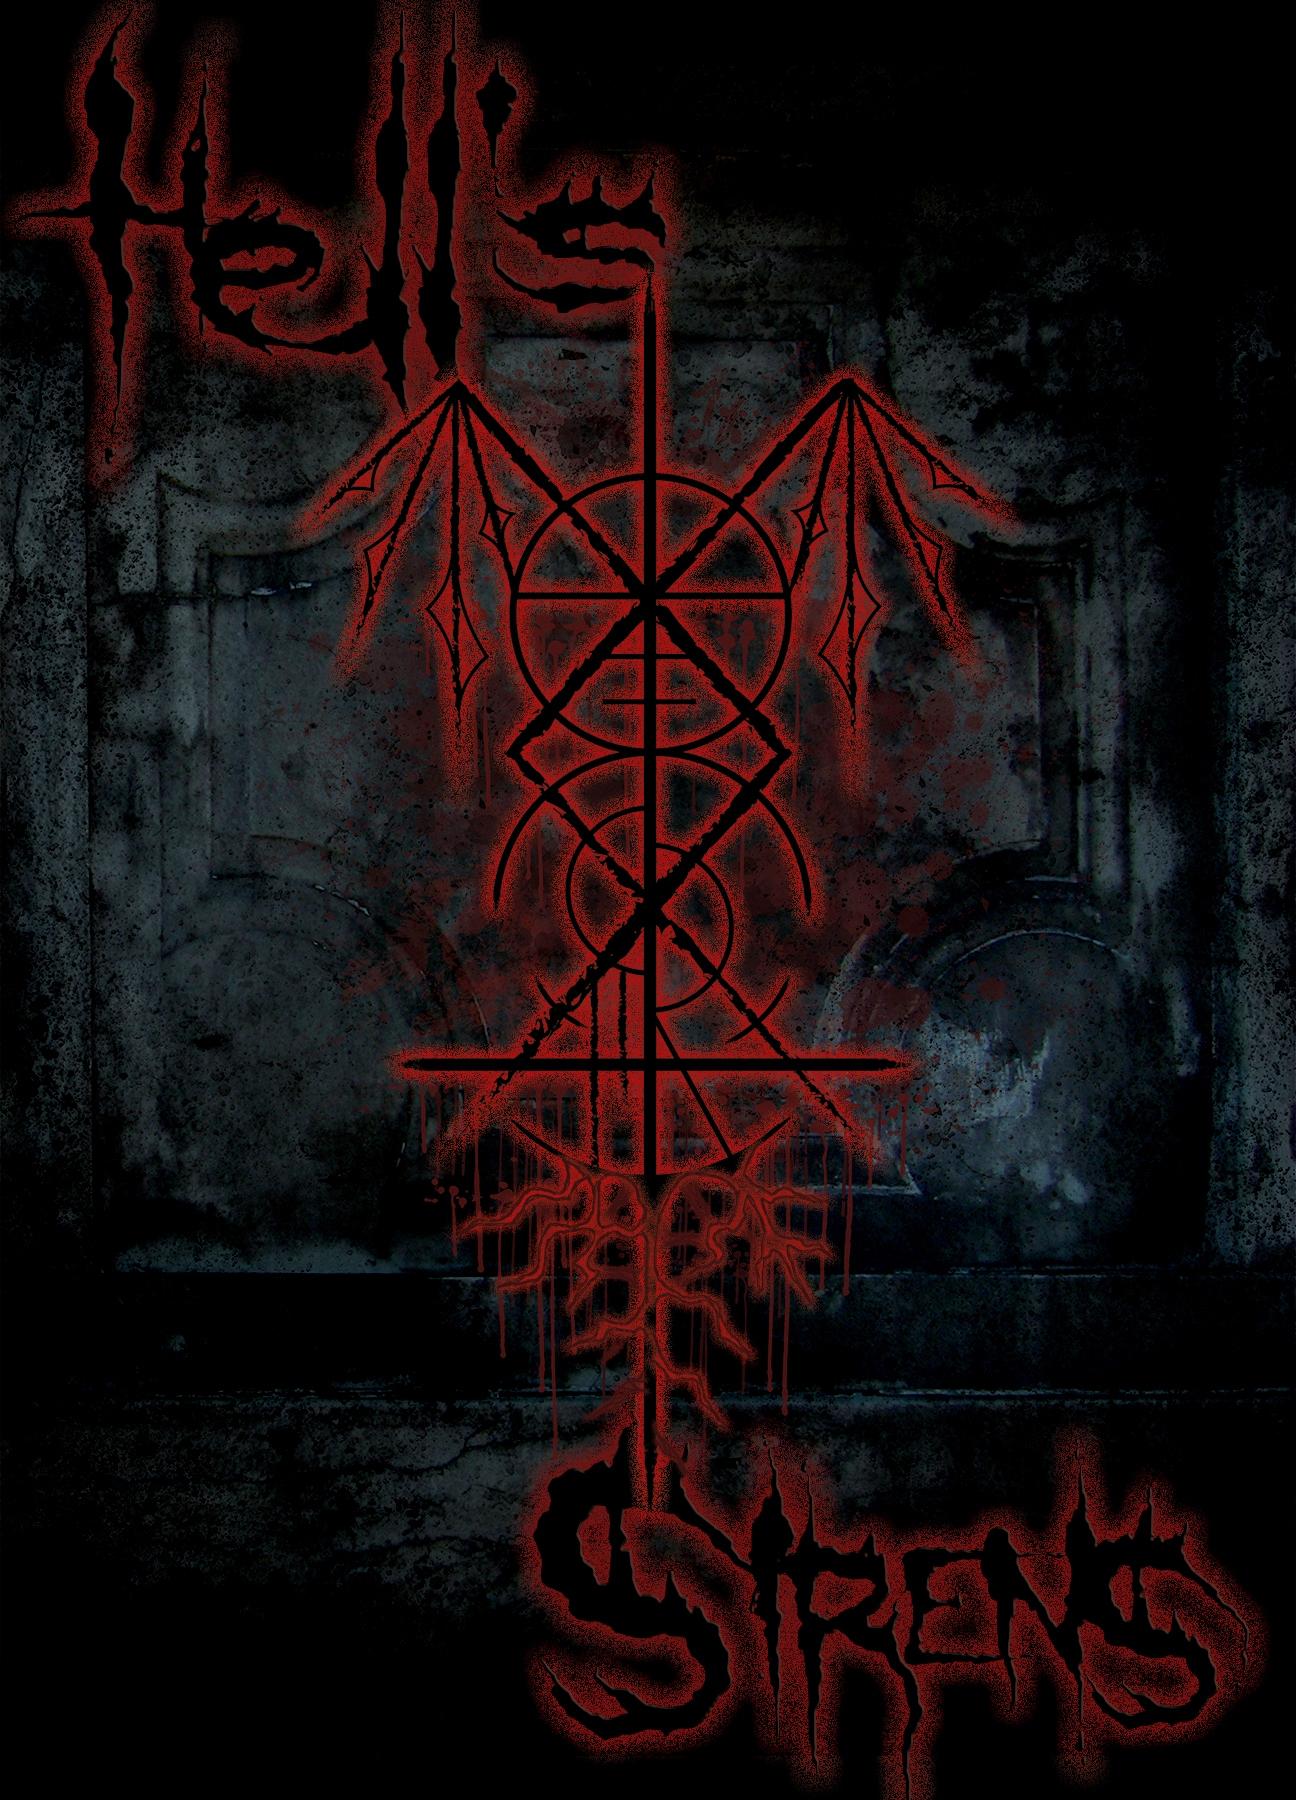 Hell's Sirens sigil